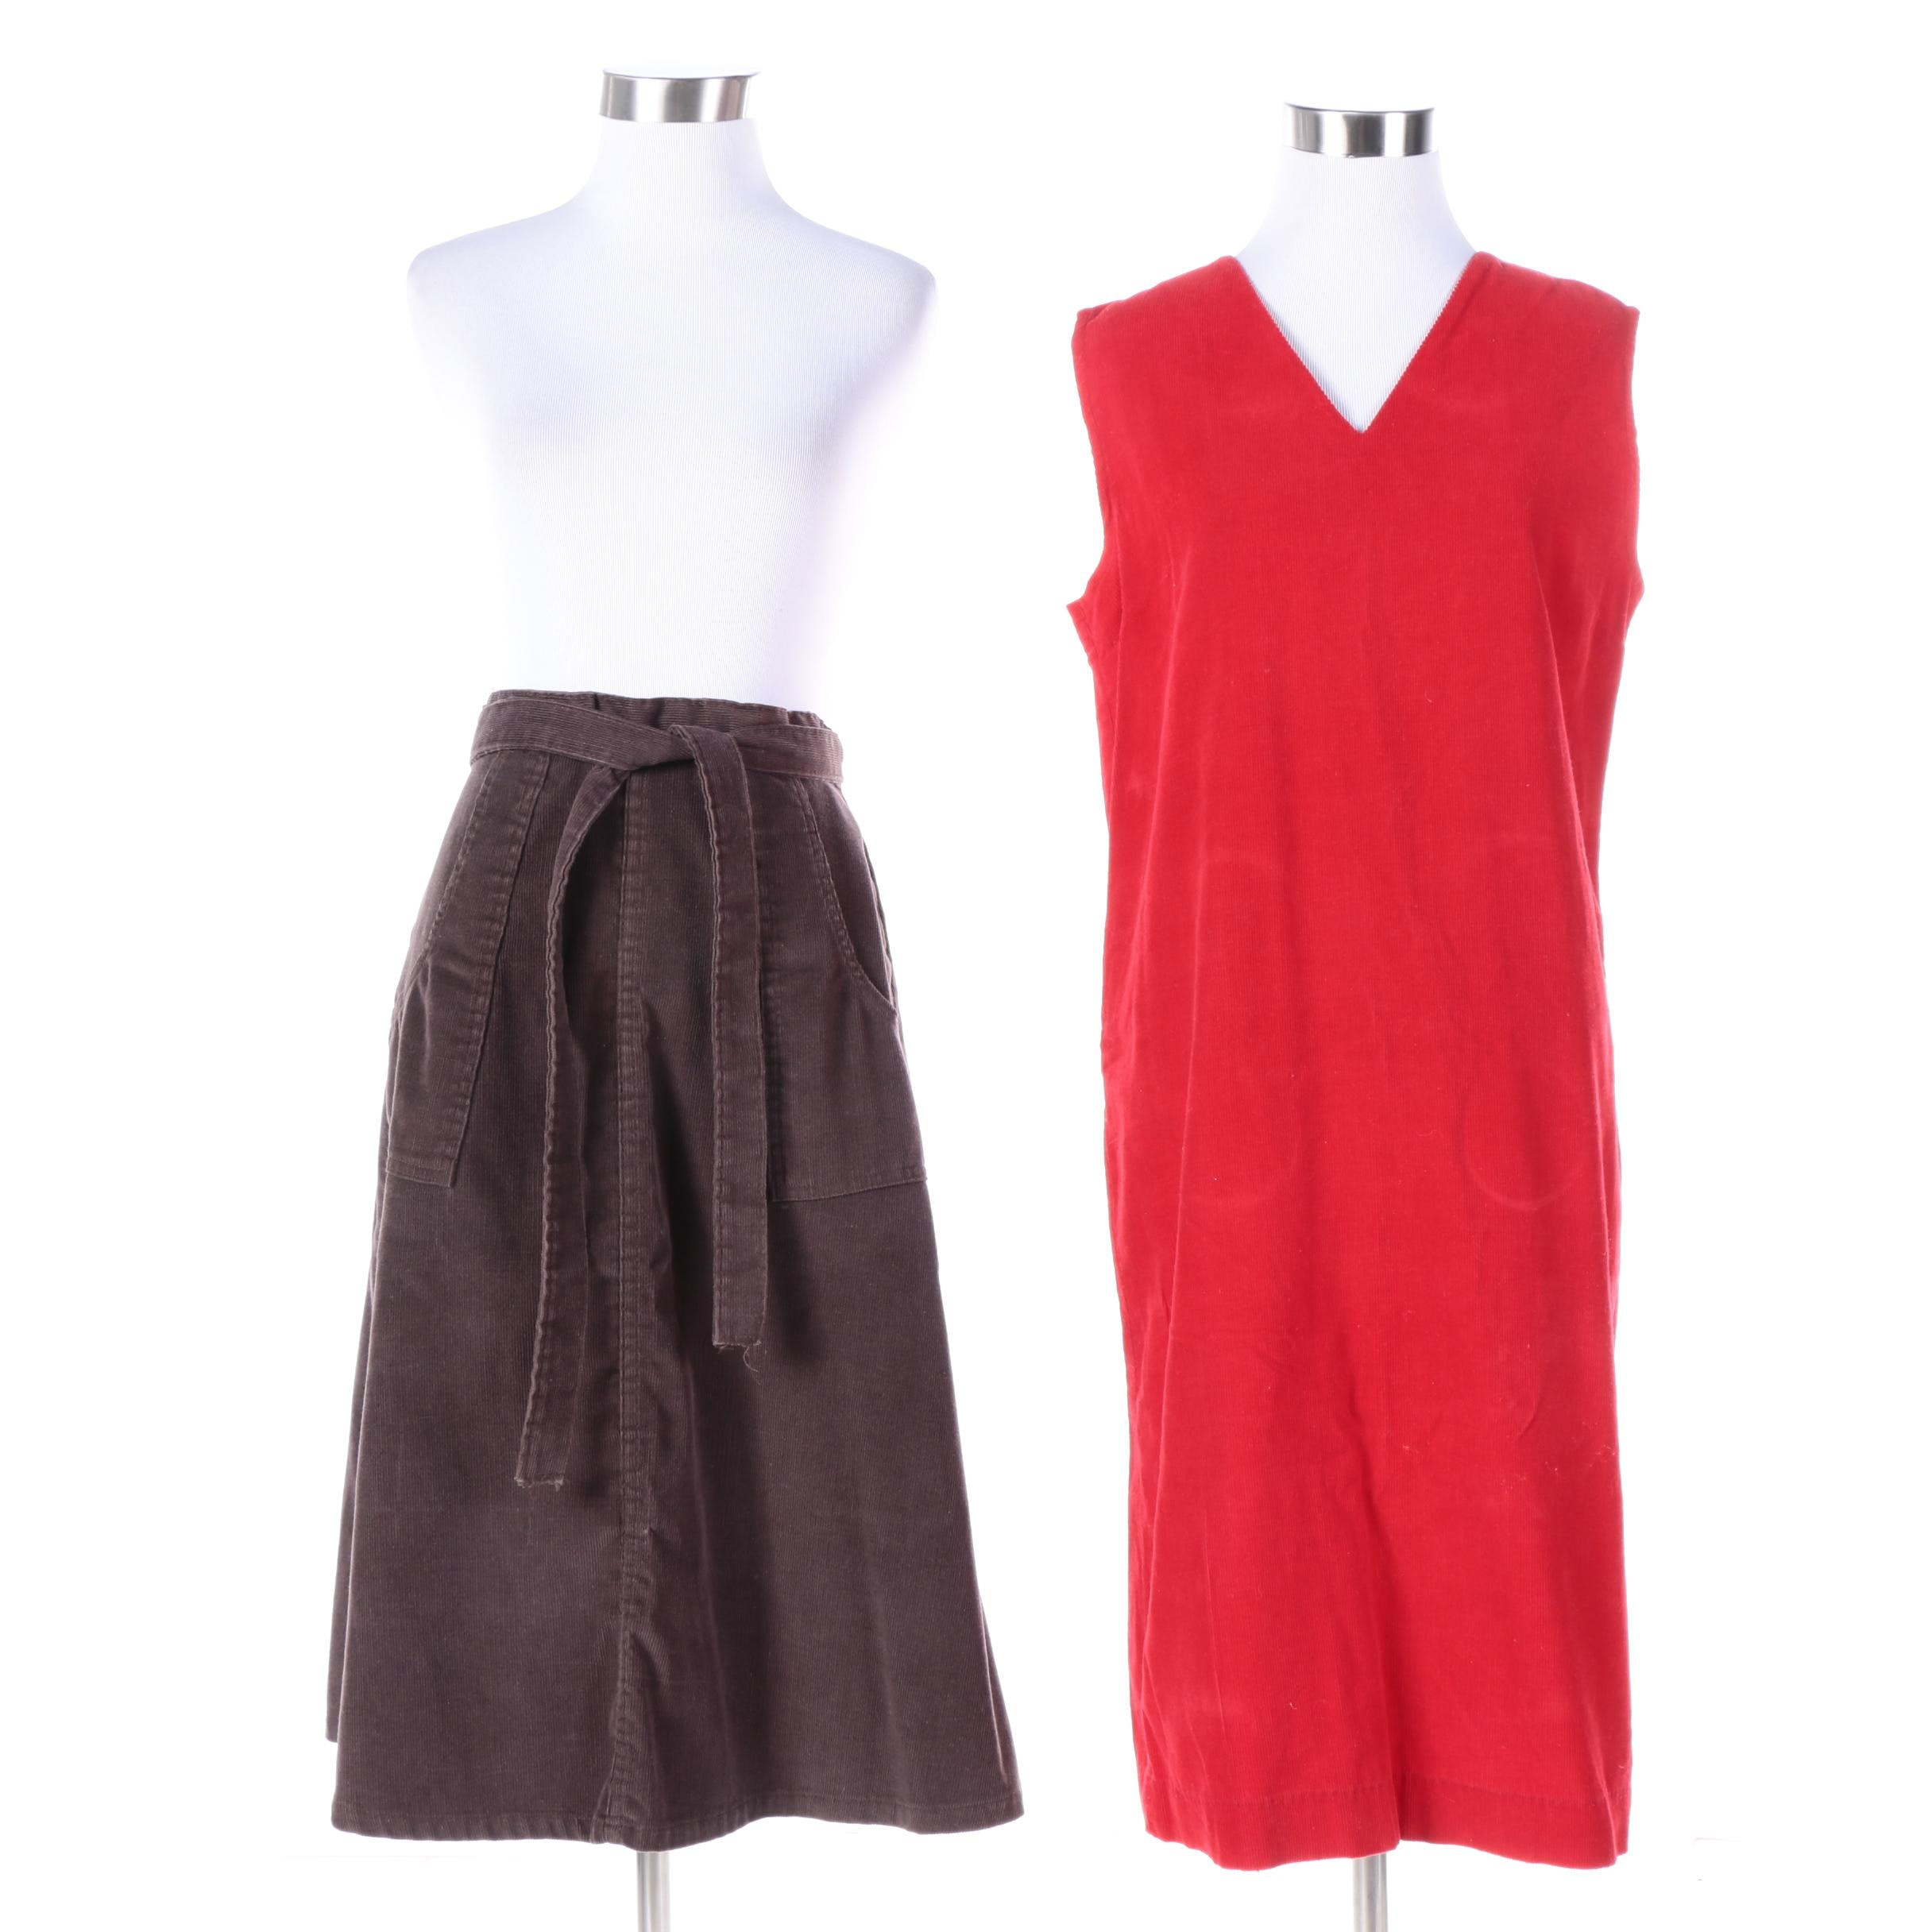 Vintage Corduroy Dress and Zayre Wrap Skirt